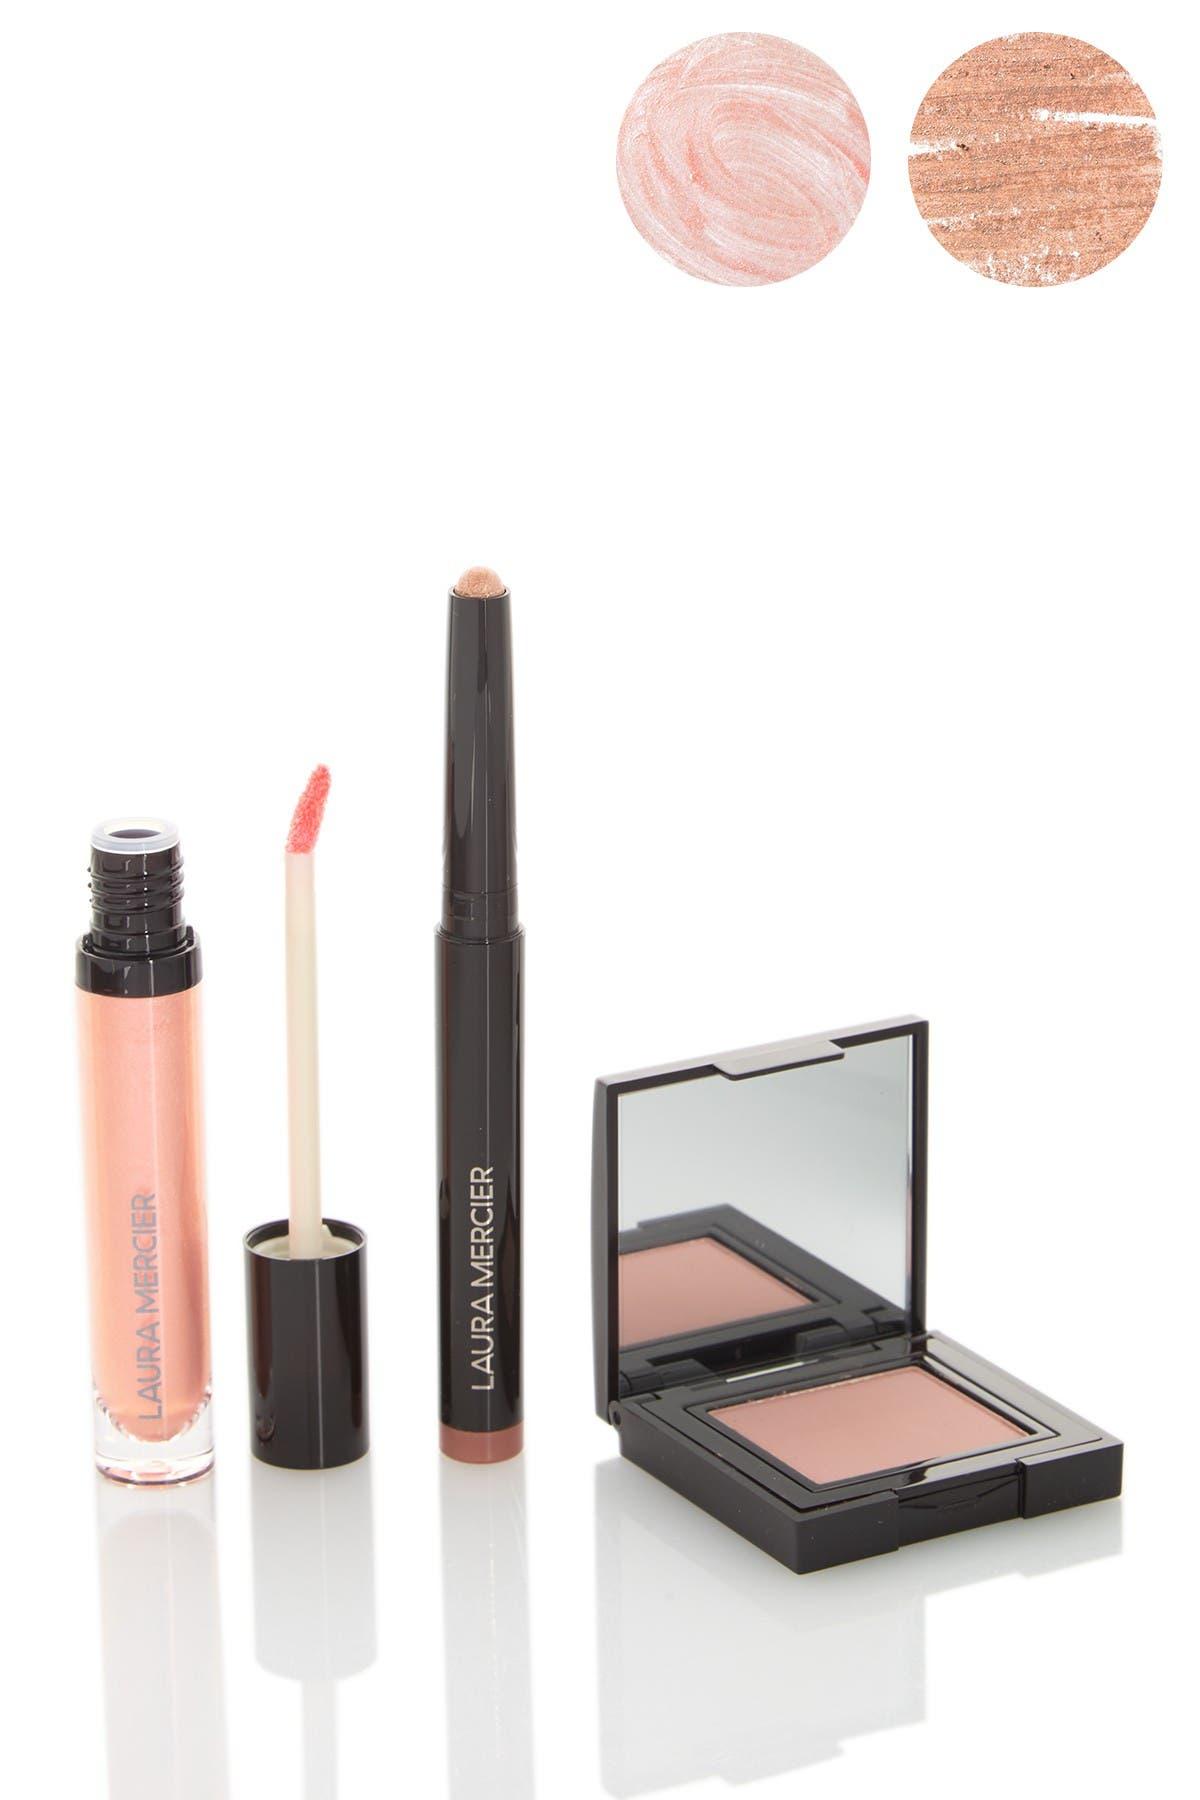 Image of Laura Mercier Caviar 3-Piece Eye Essentials Set